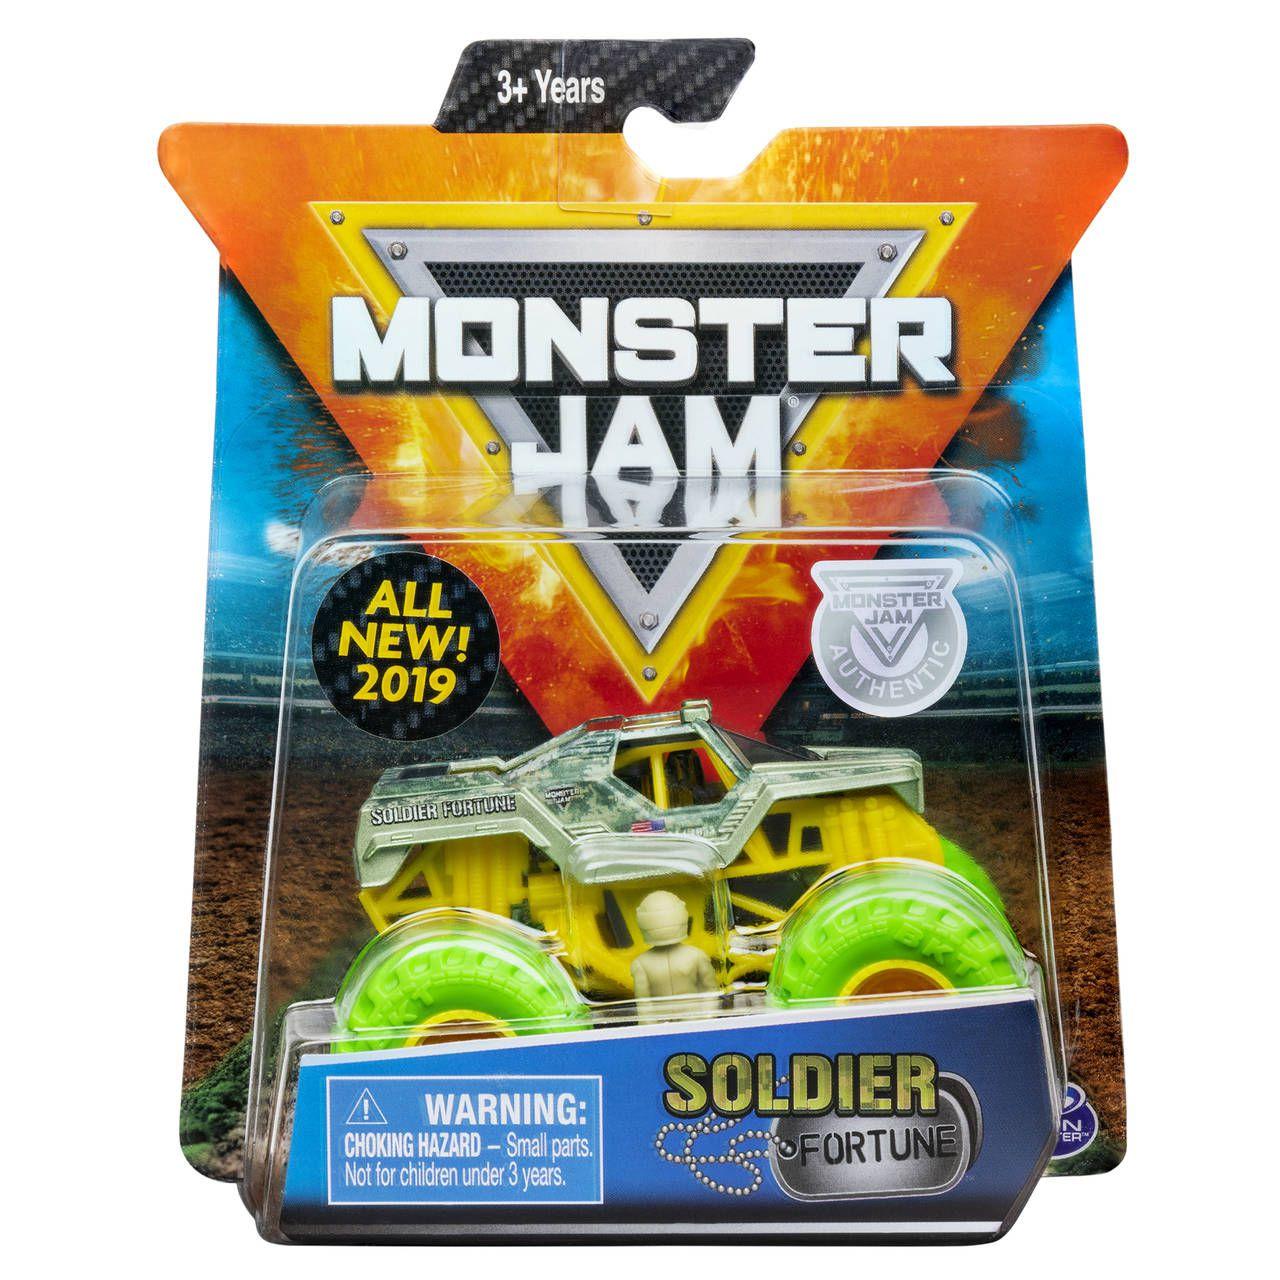 Monster Jam Truck - Soldier Fortune - Escala 1:64 - Original